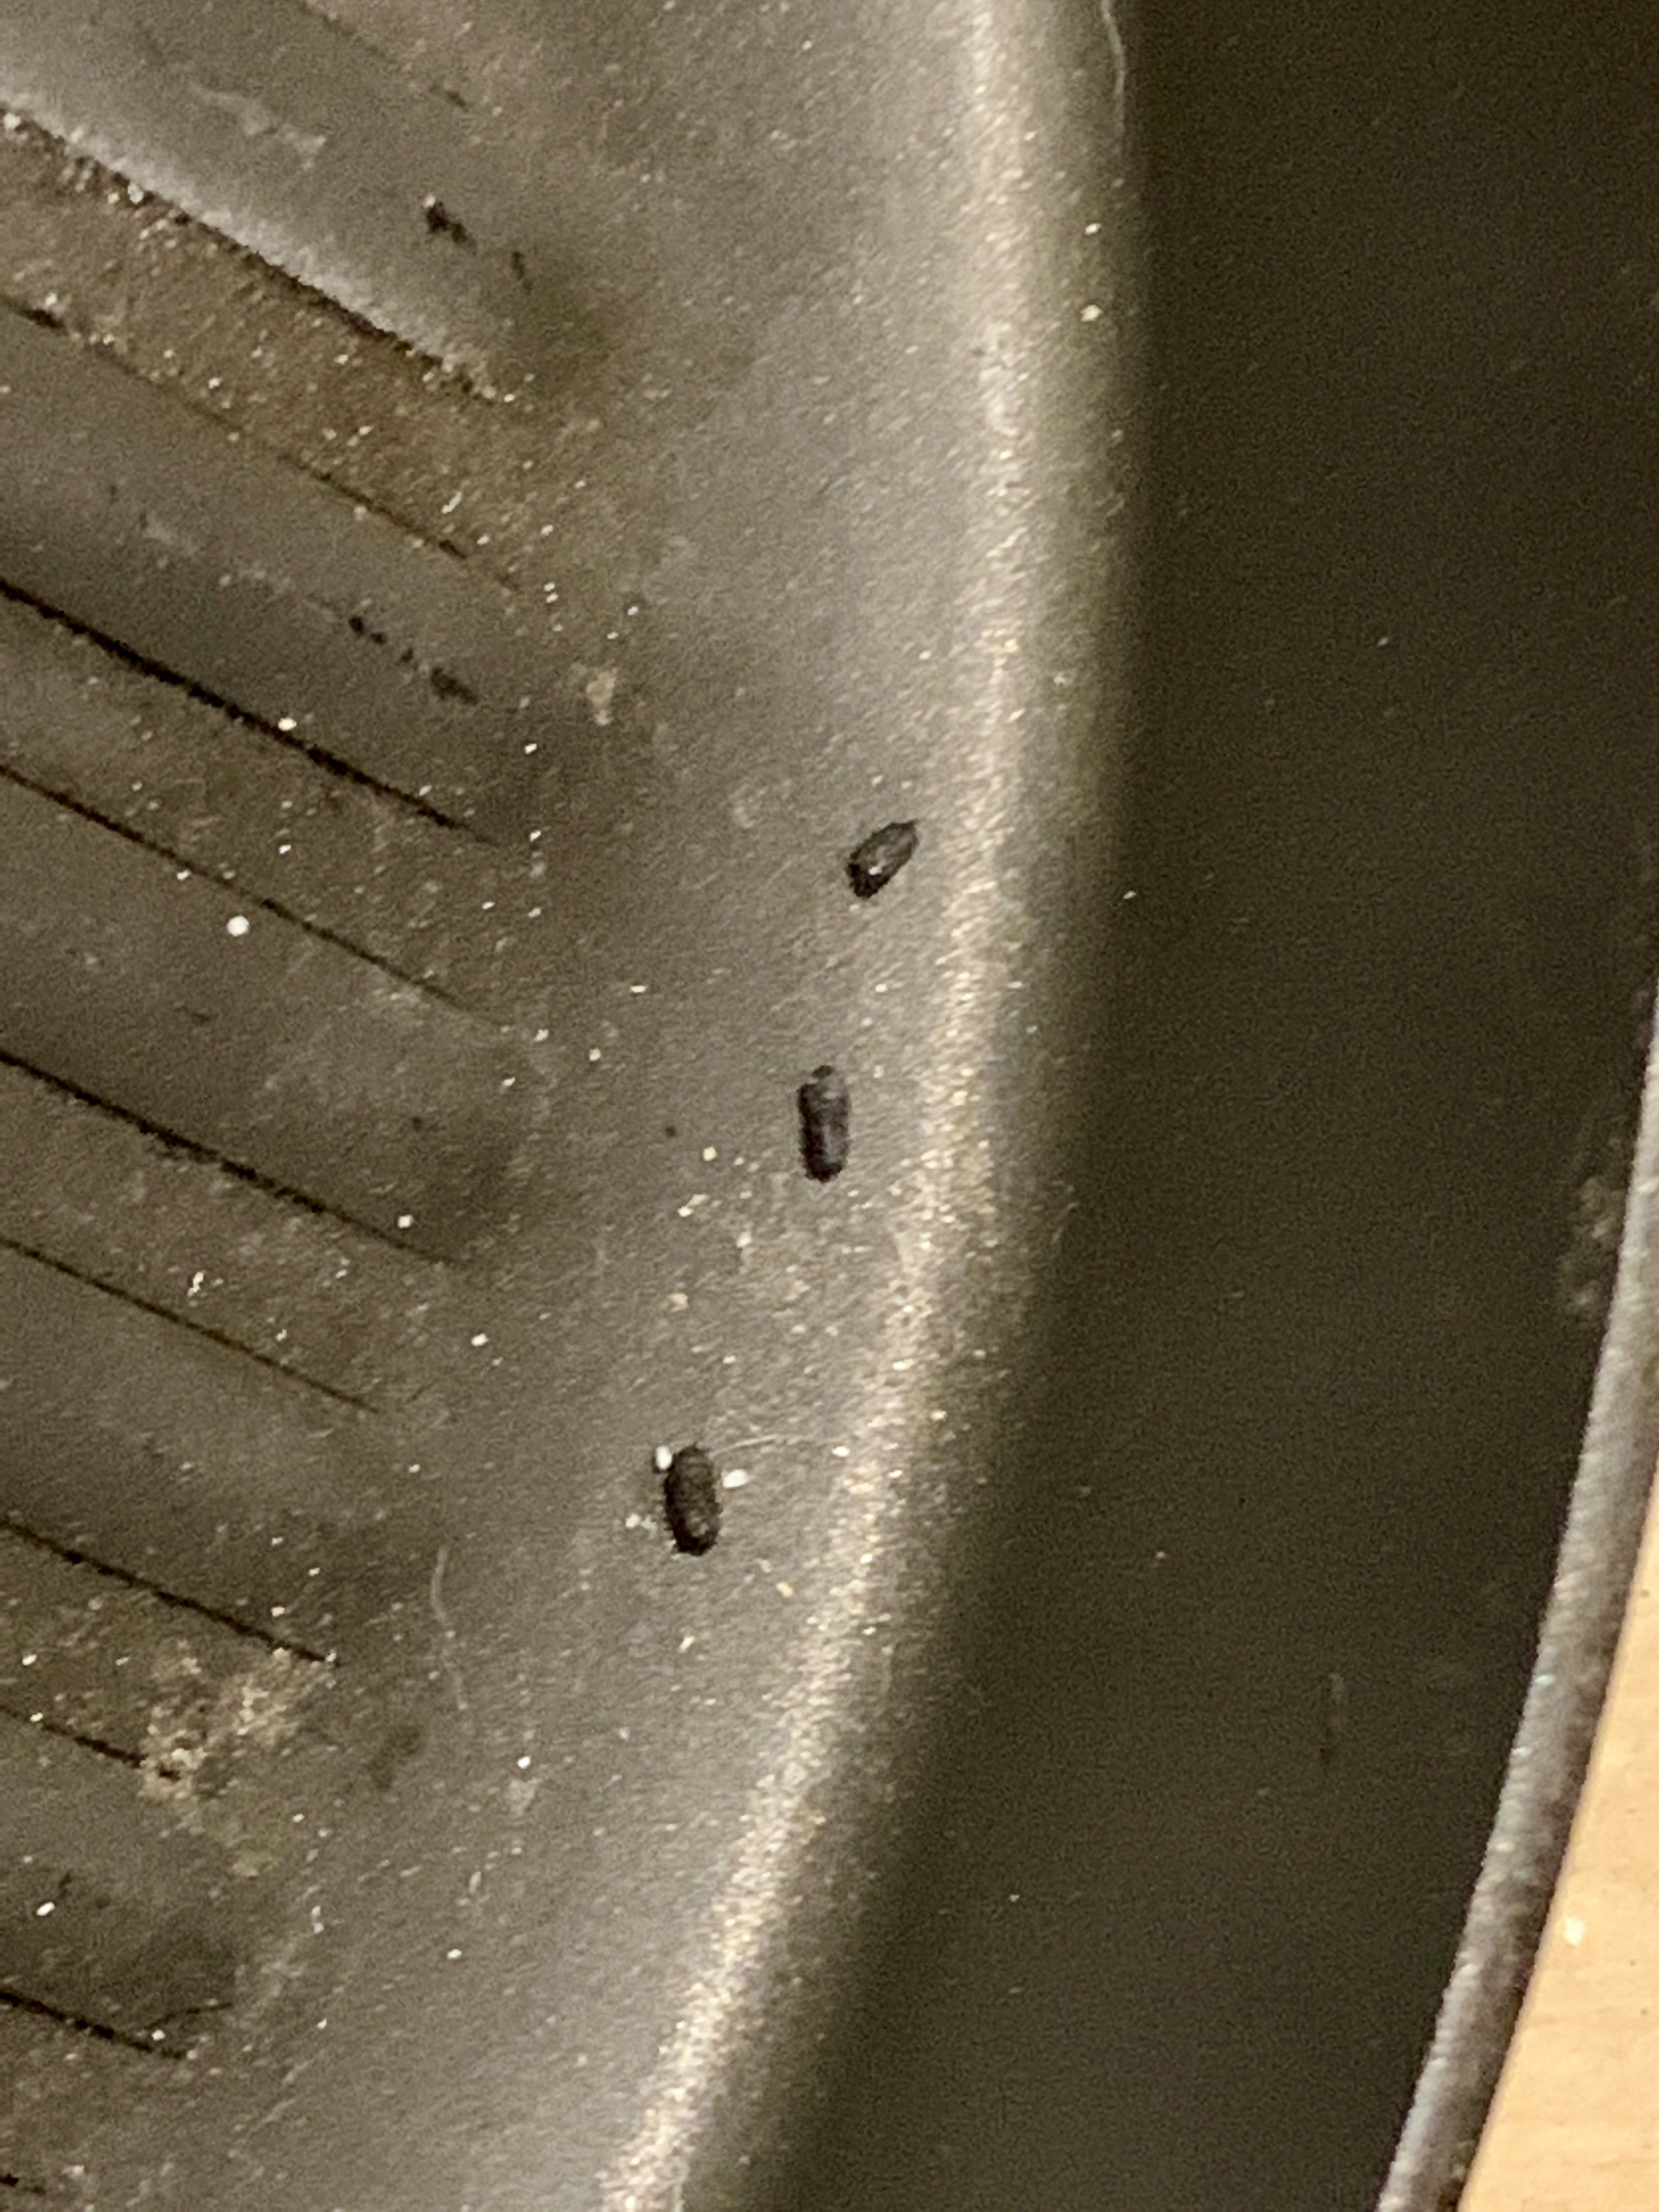 mouse poop in frying pan using airbnb